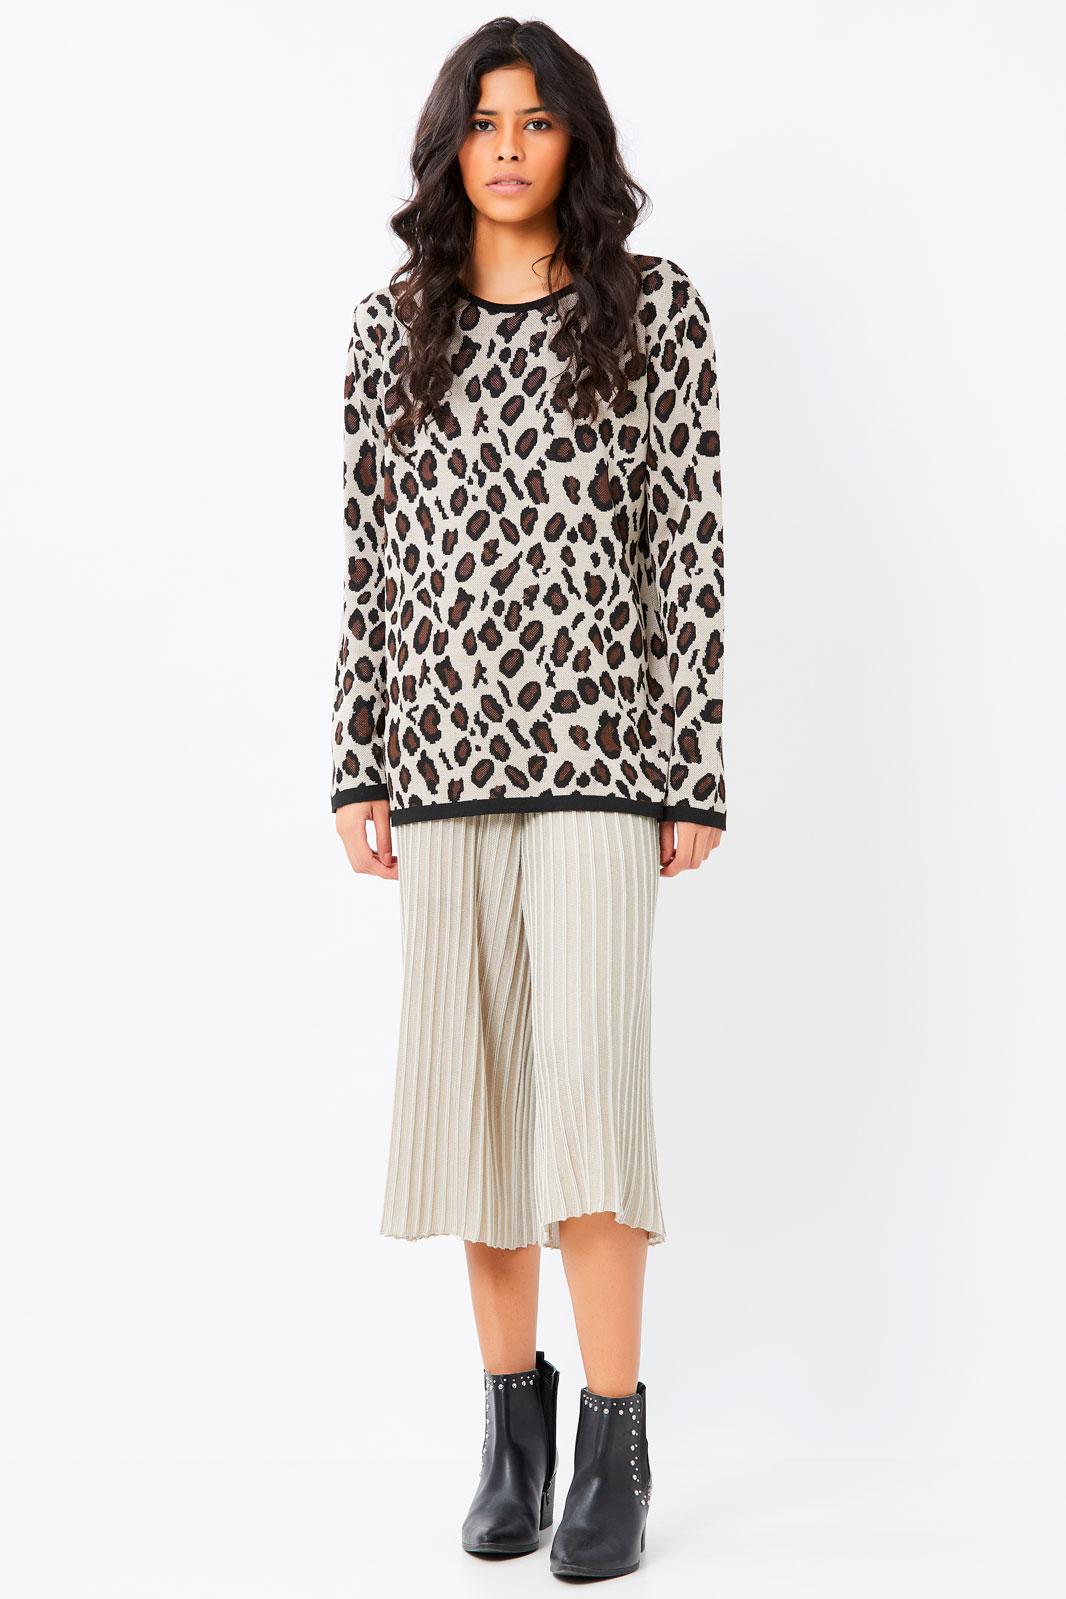 Blusa Suéter Ralm manga longa tricot animal print - Preto/Bege